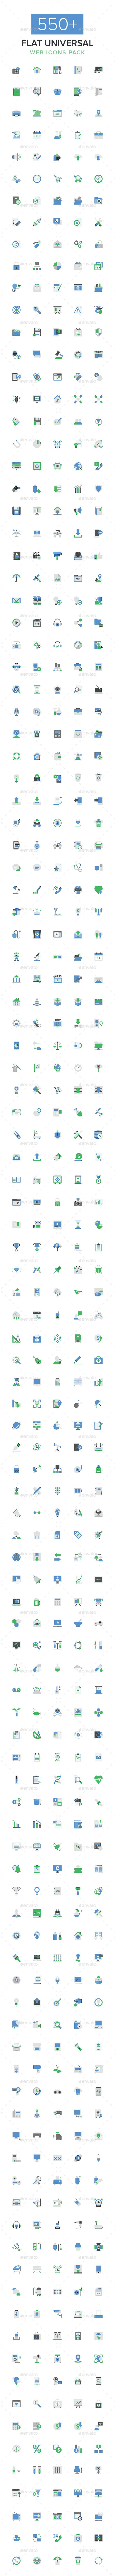 550+ Flat Universal Web Icons Pack - Web Icons